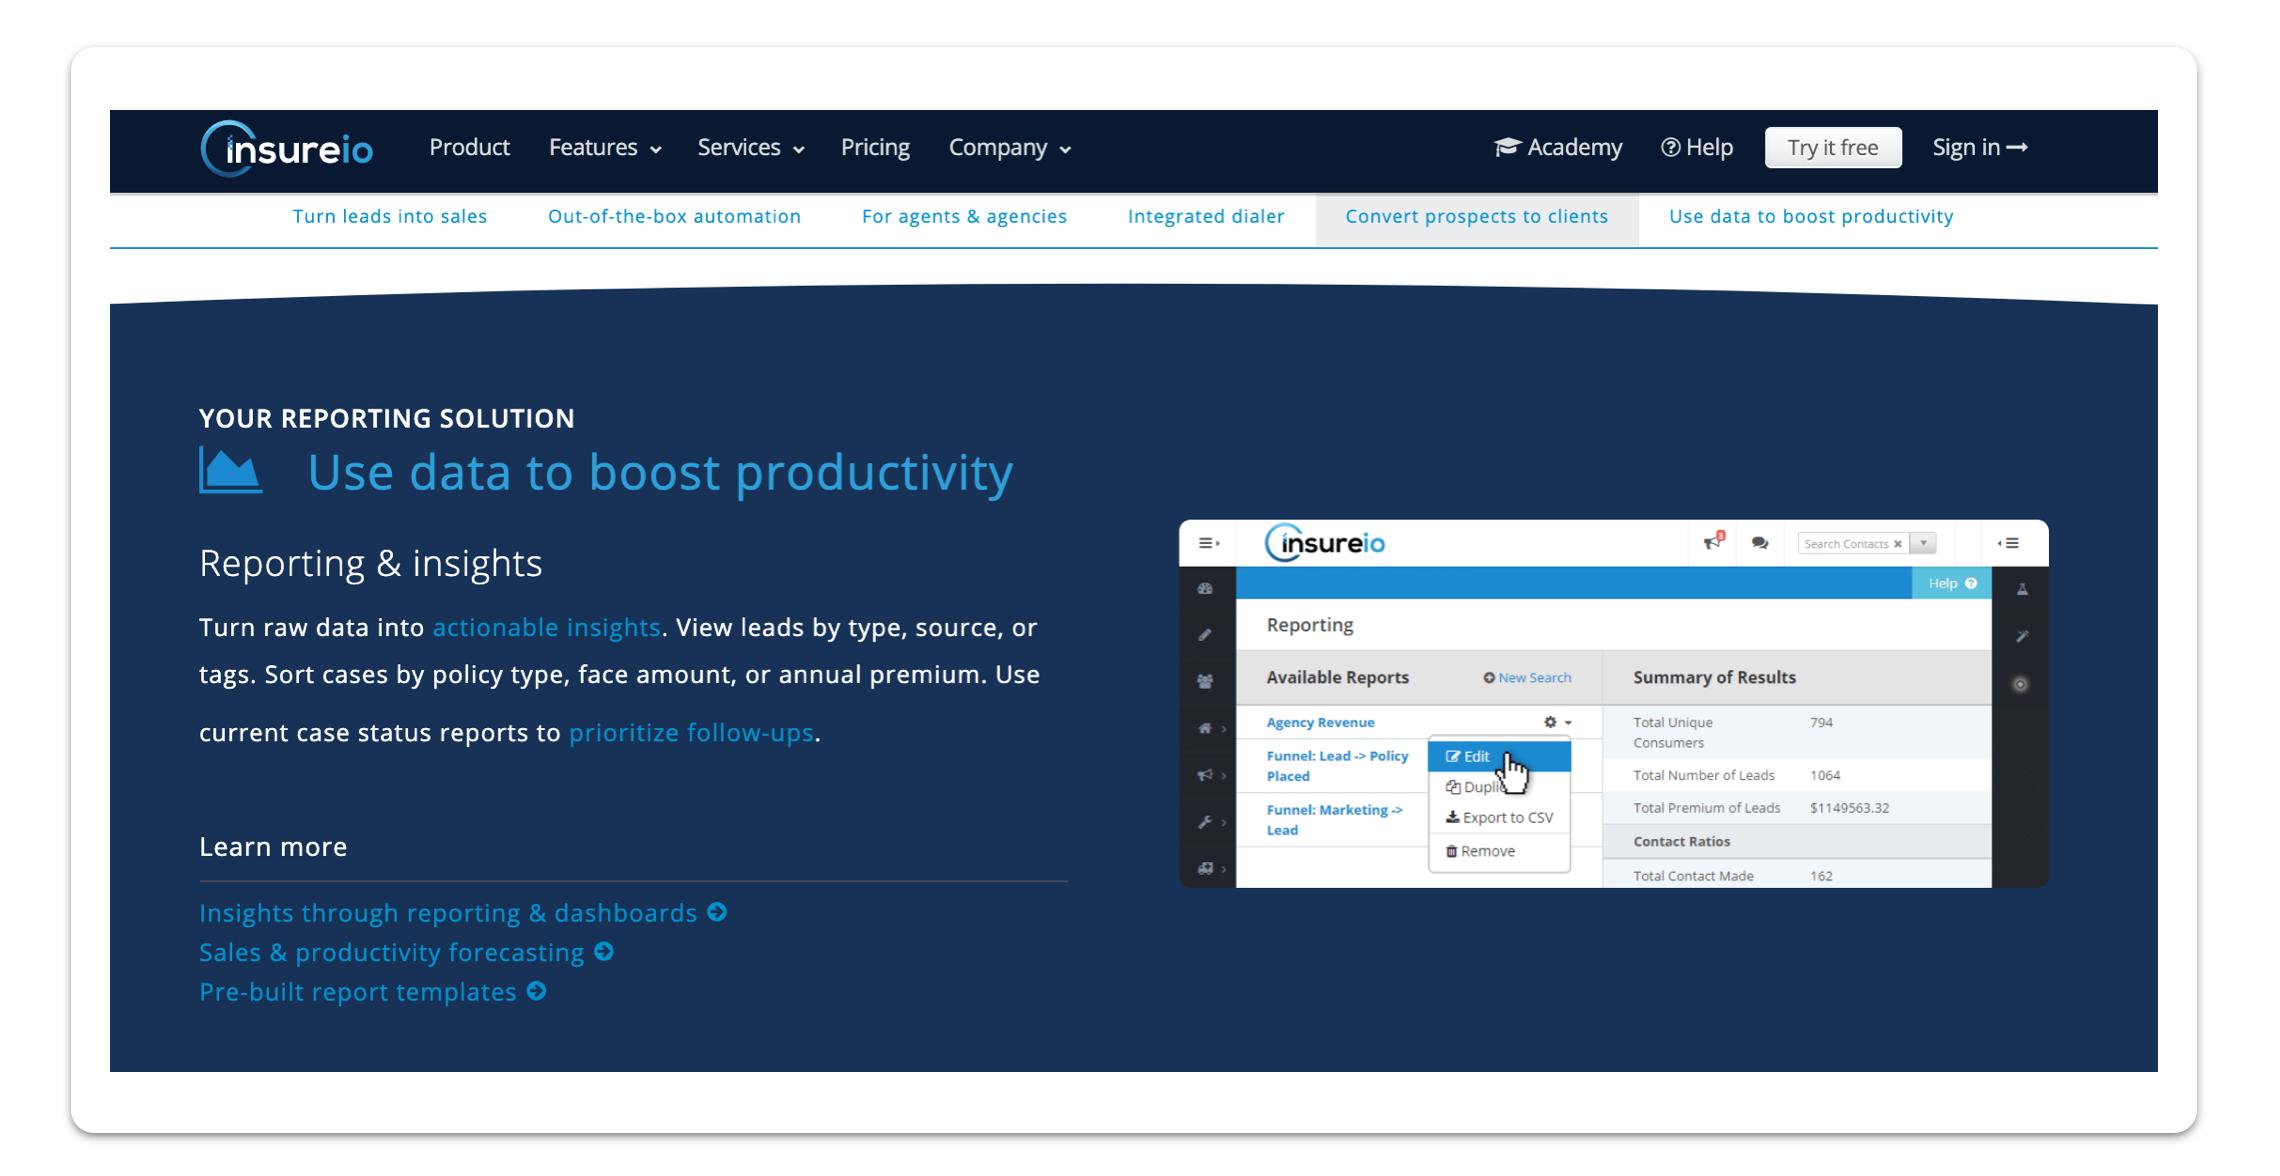 Insureio CRM screenshot